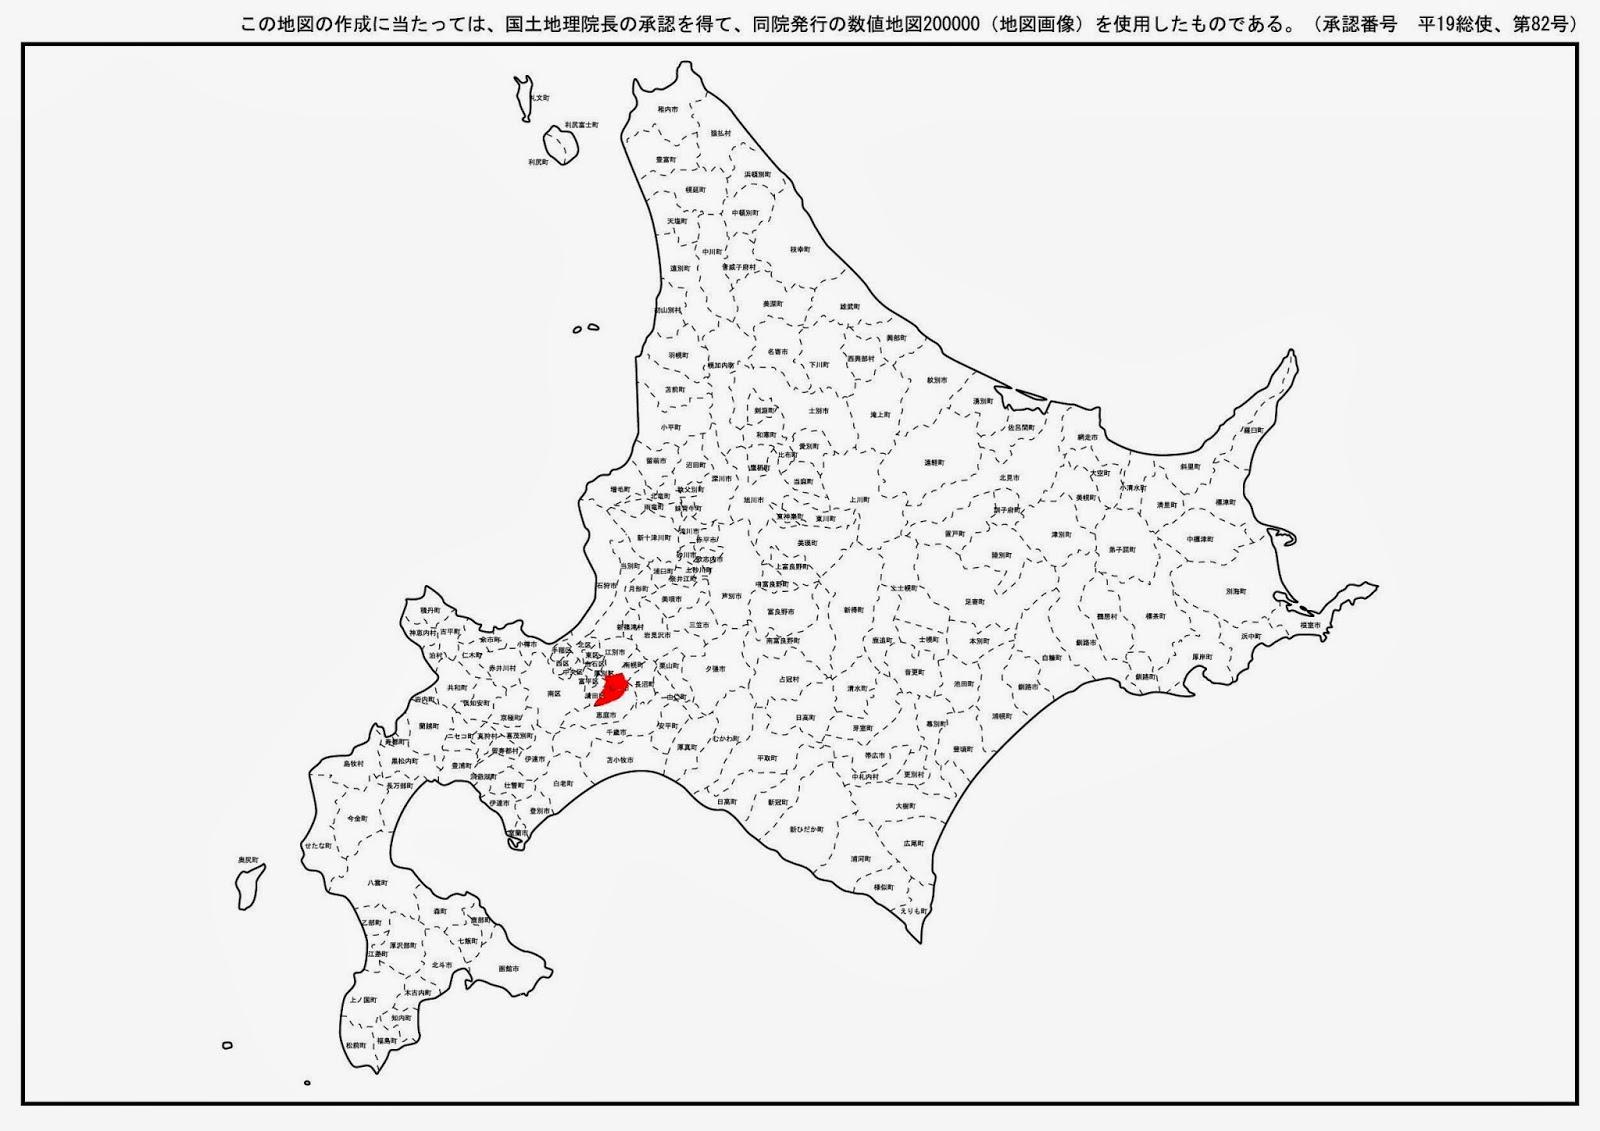 dryascw: ○ファースト札幌郡 (JCG01029, JCC0134) JA8OHG